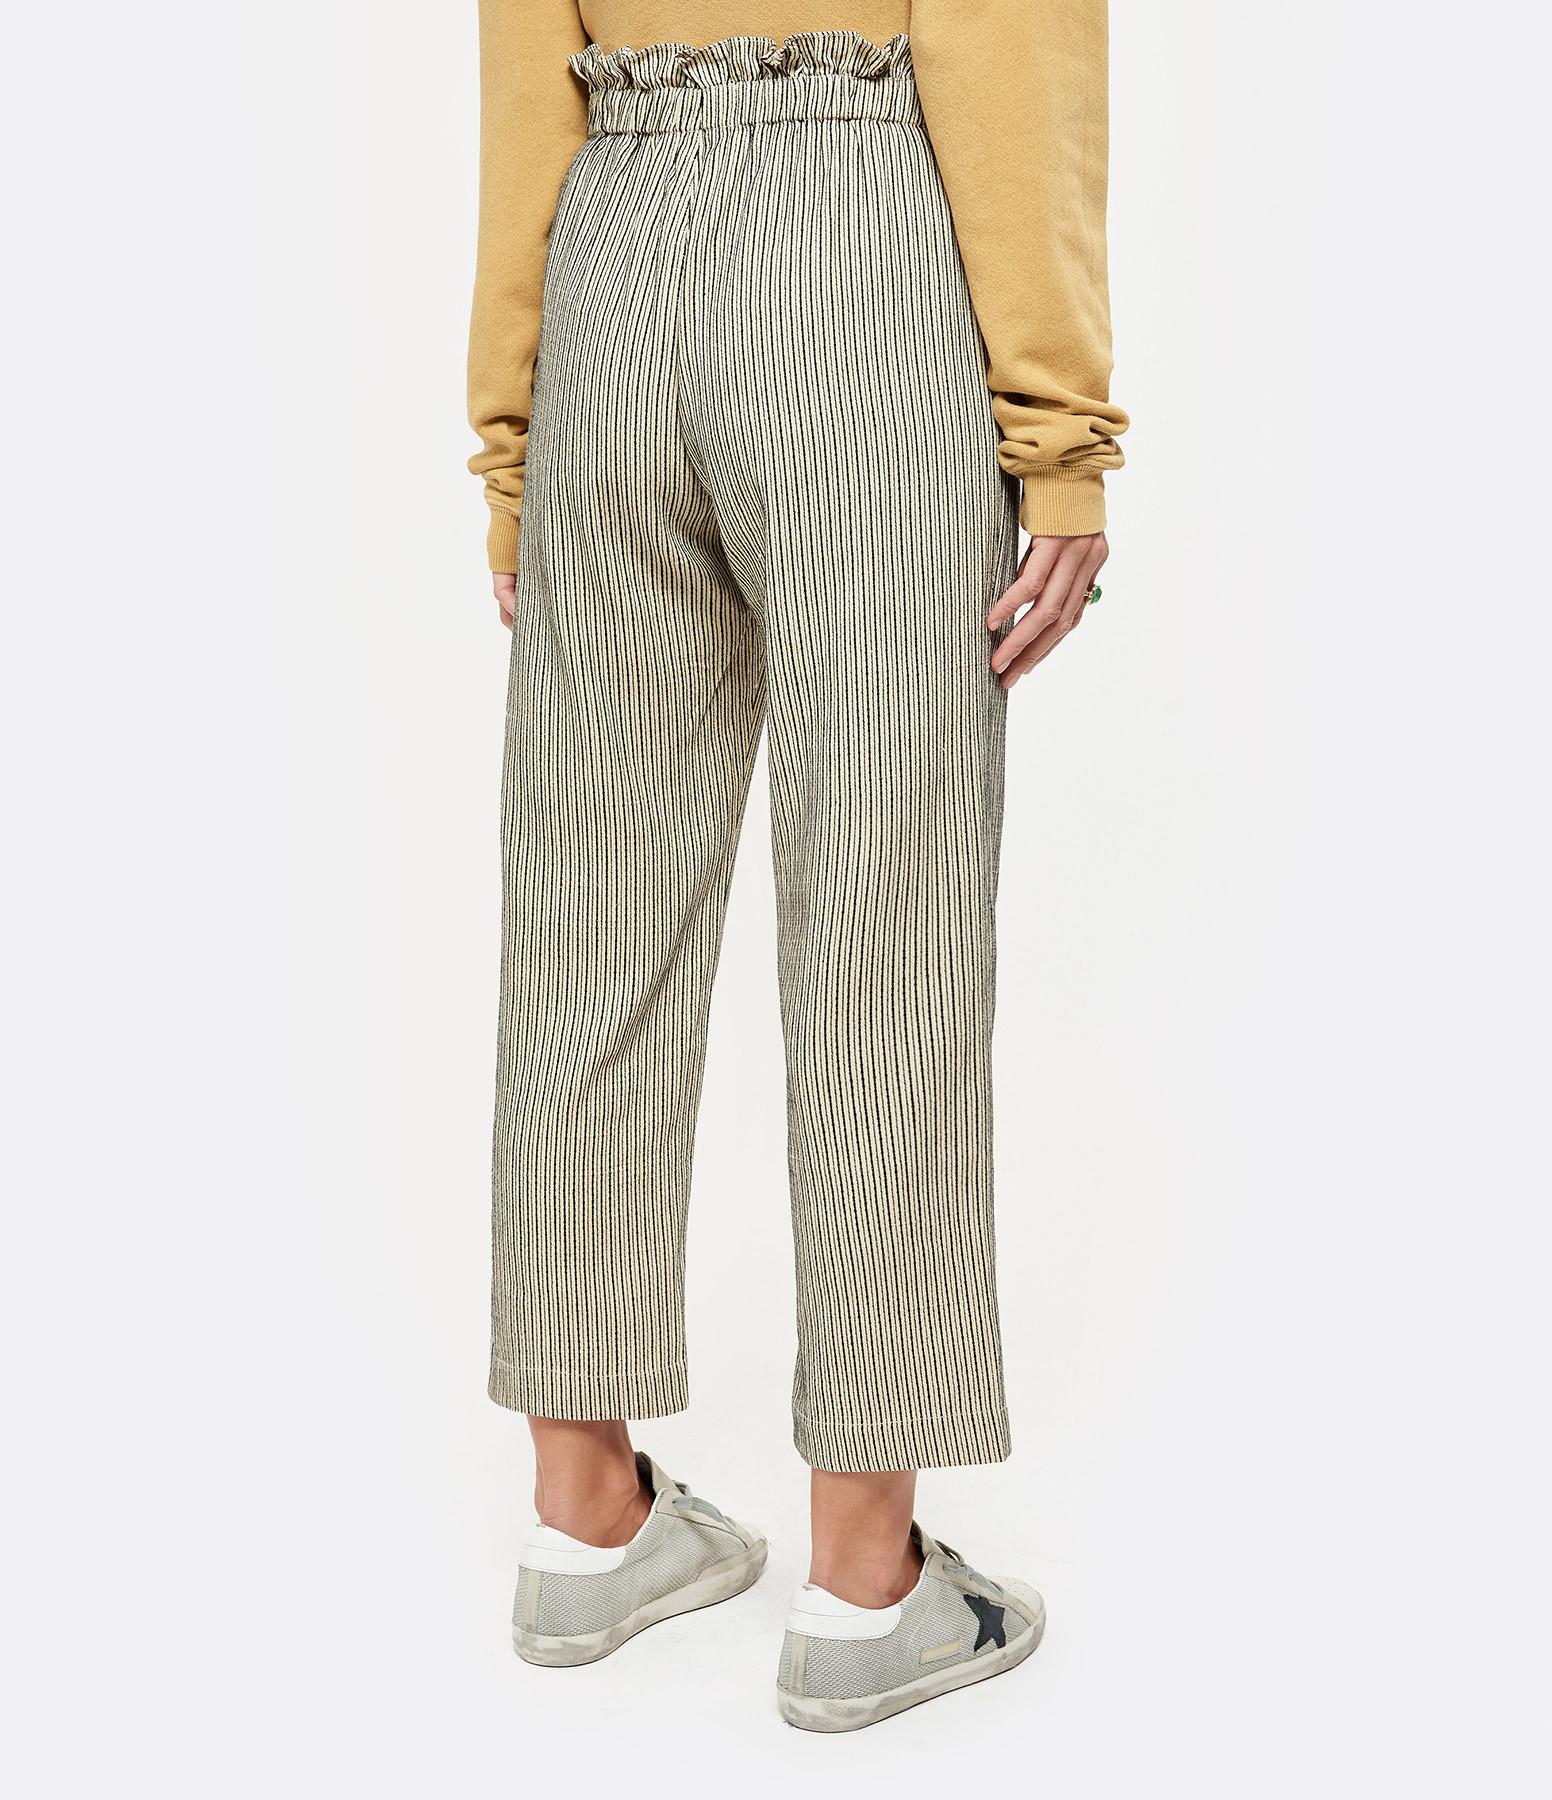 THE GREAT - Pantalon The Zip Gunny Lin Rayures